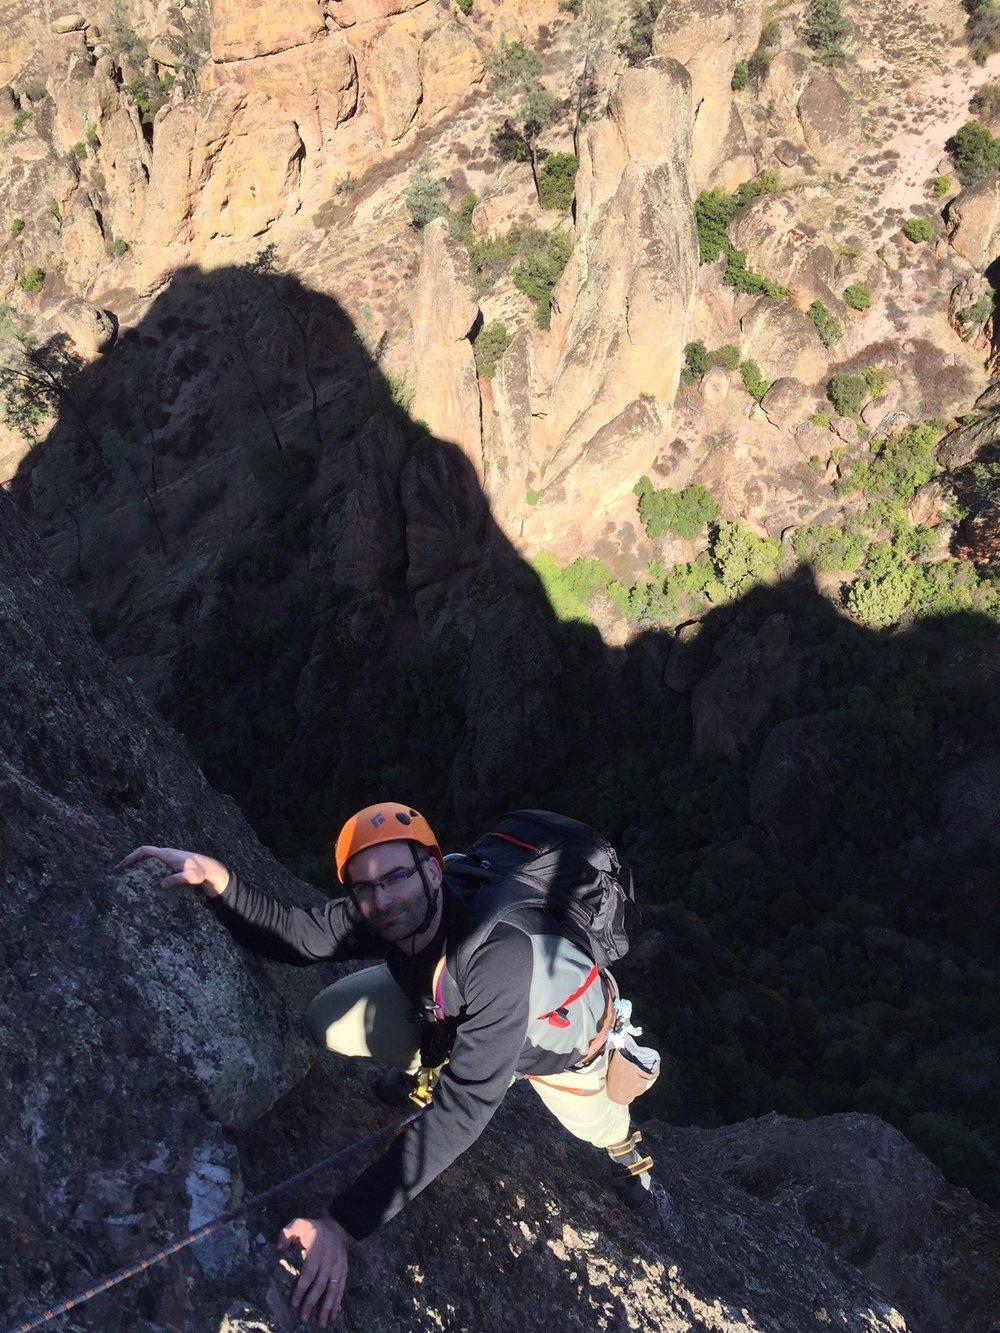 Alpine Climber Pinnacles National Park Rock Climbing SAANO Adventures Trad Climbing Multi Pitch.JPG